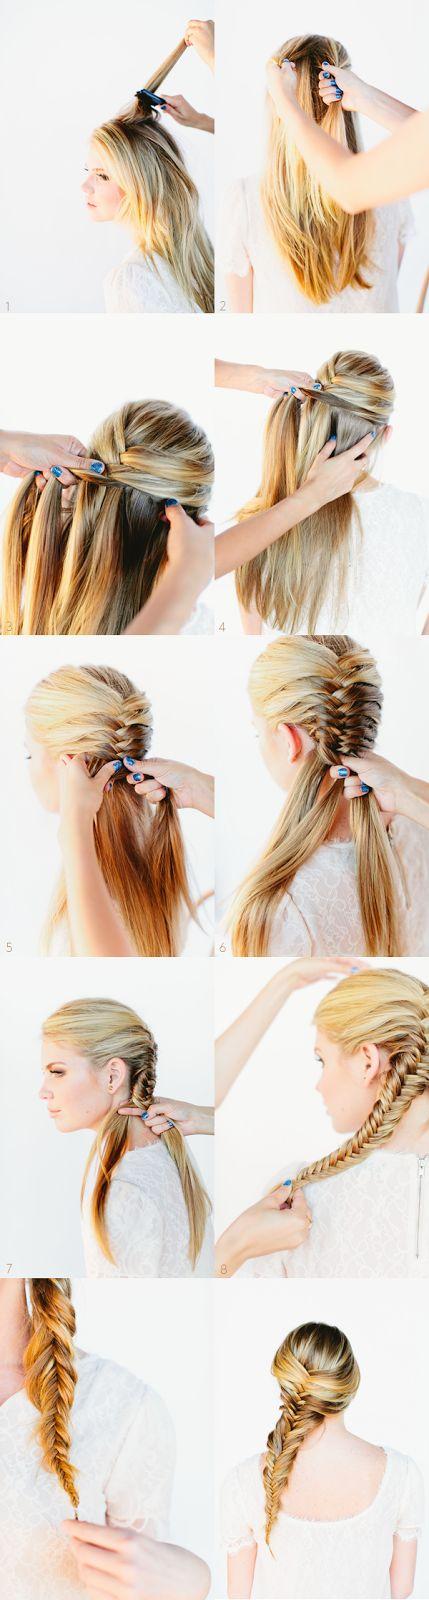 FISHTAIL BRAID HAIR TUTORIAL | She's Beautiful